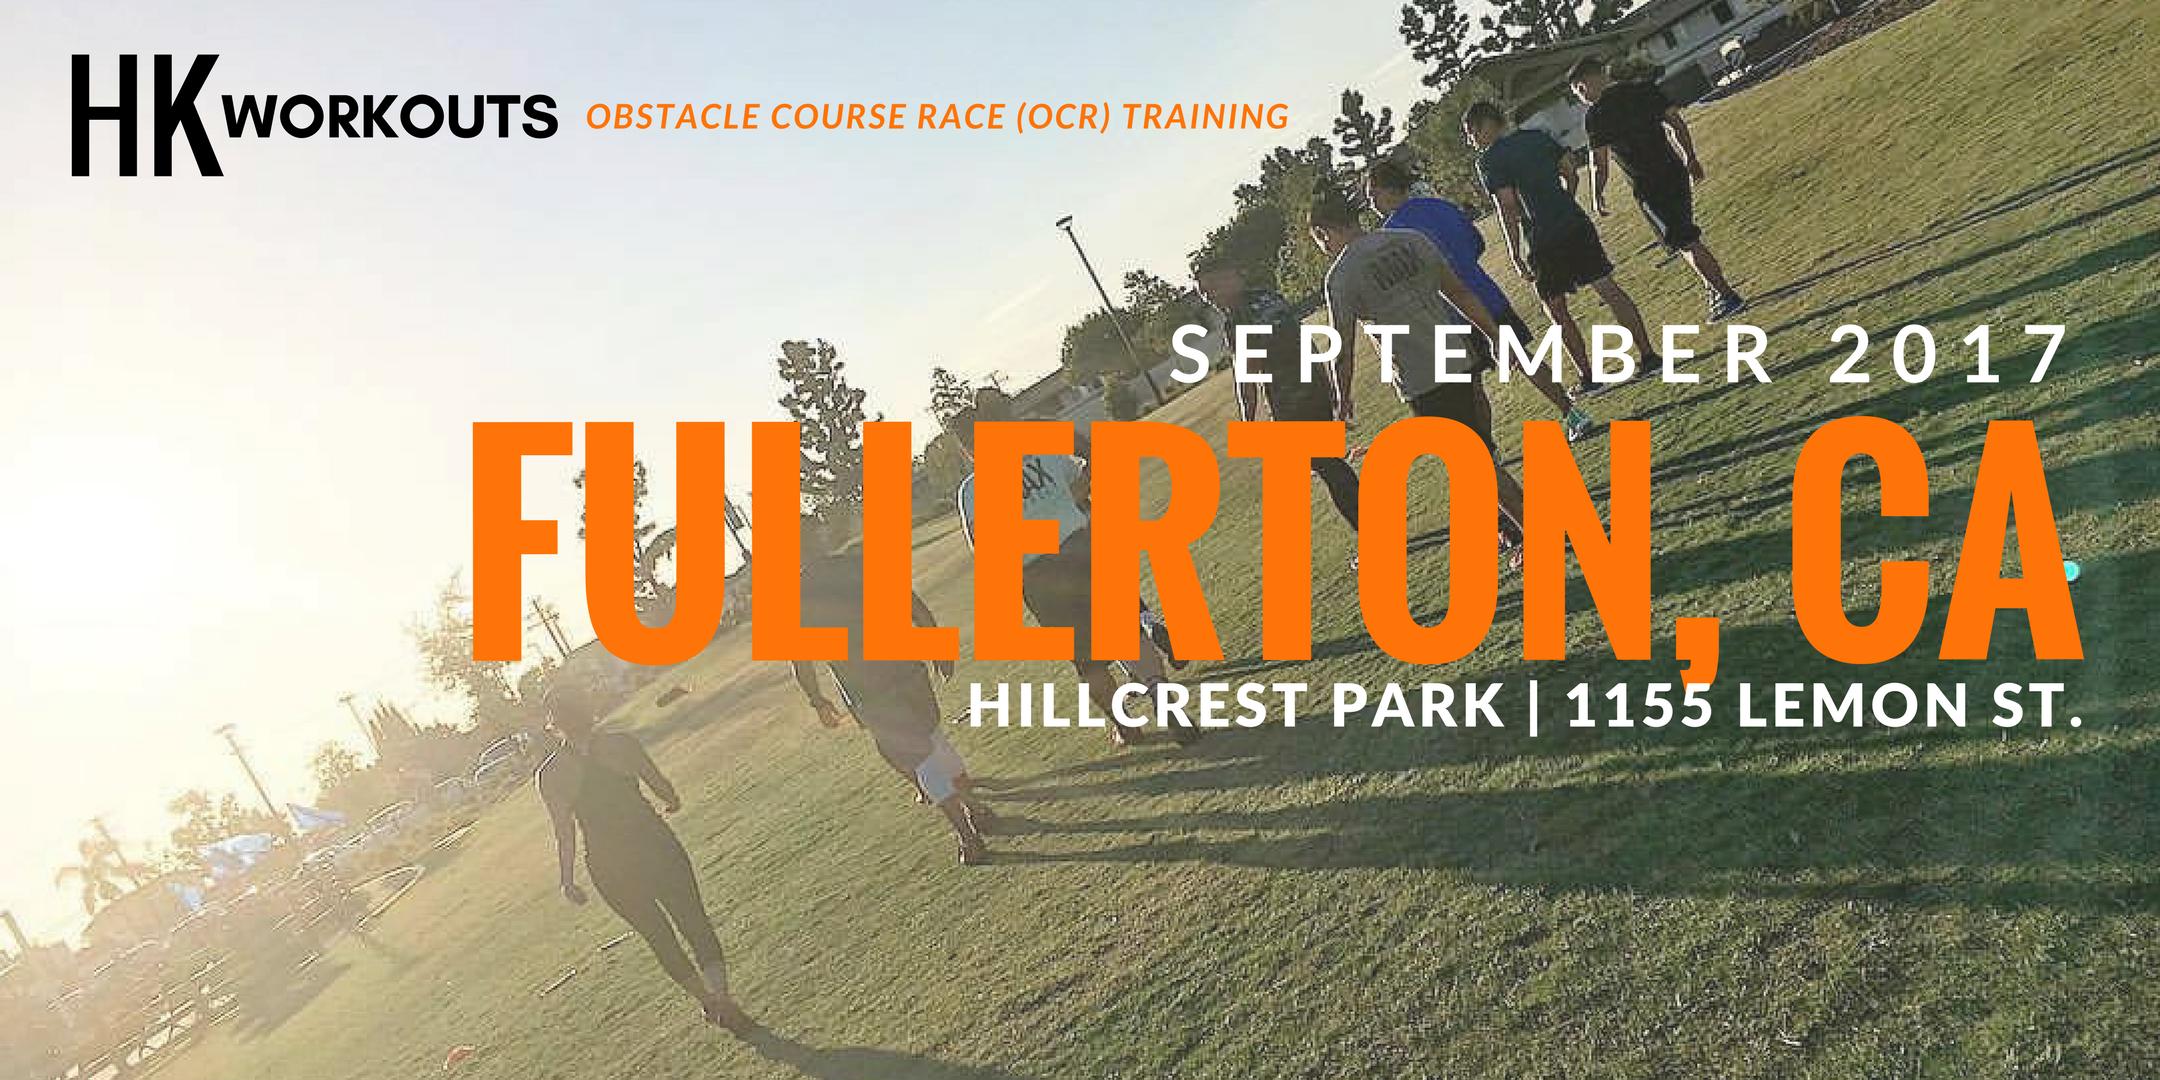 HARDKOUR WORKOUTS - Fullerton, CA // 09.23.17